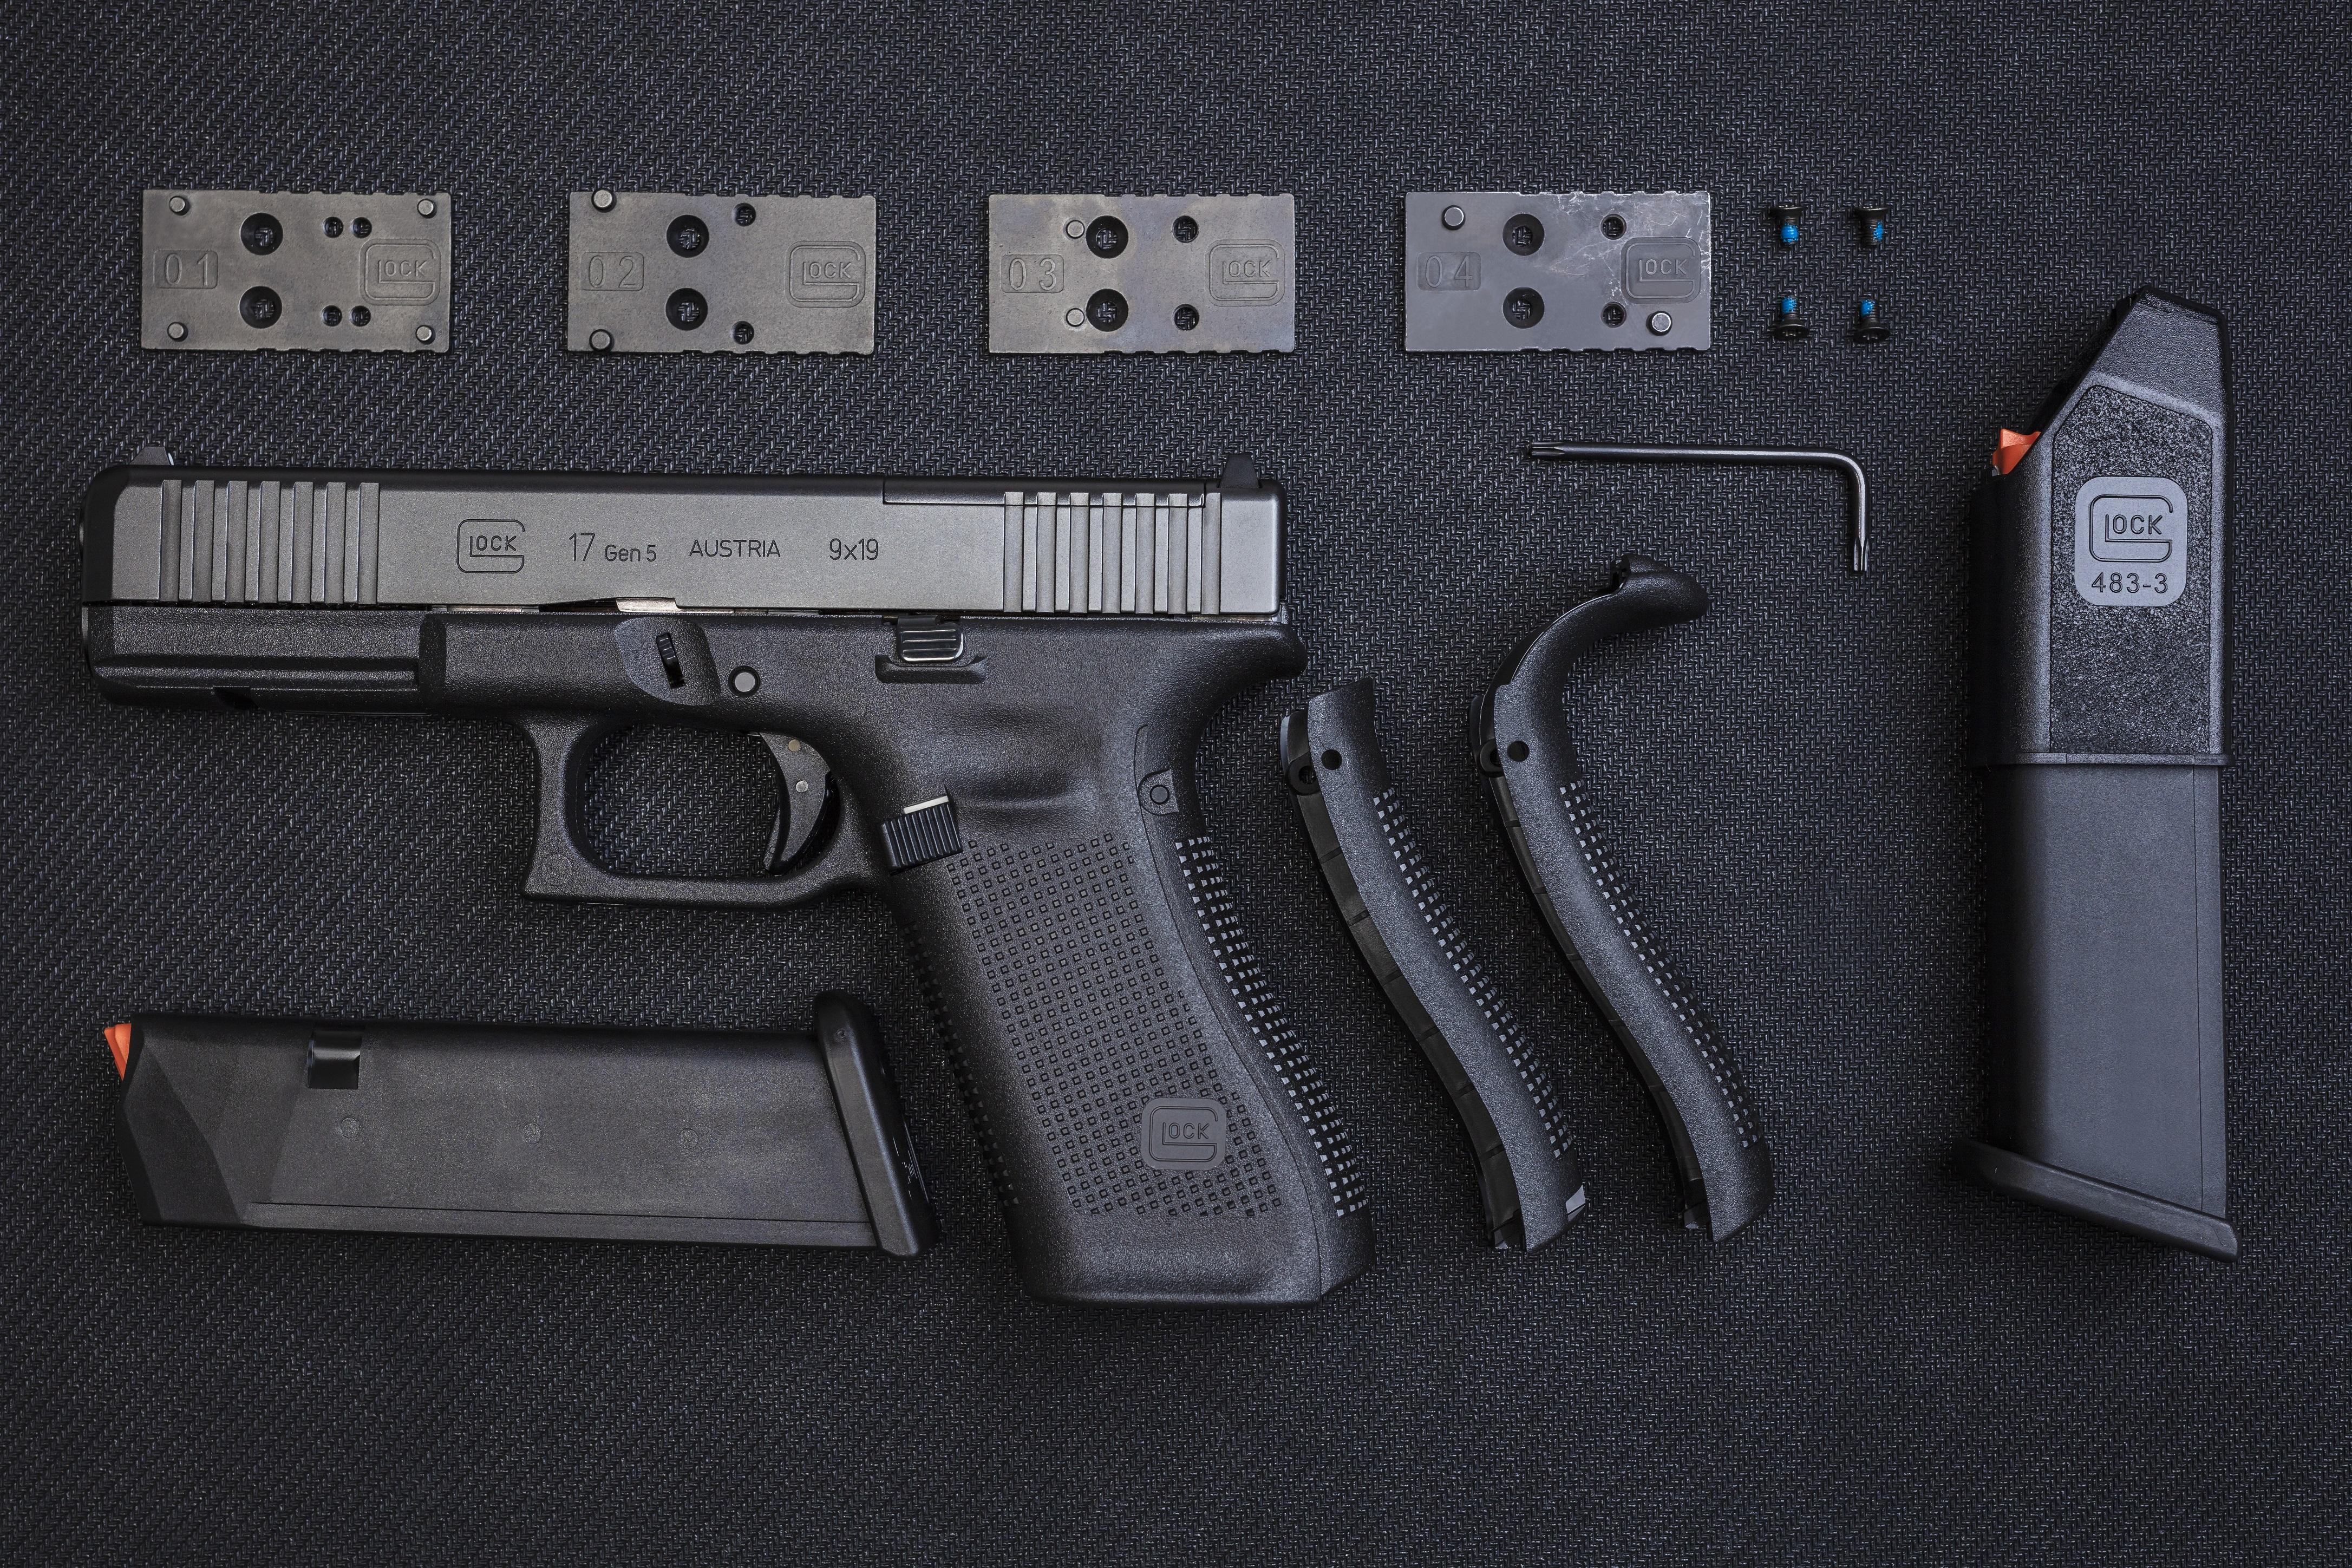 Samonabíjecí pistole Glock 17 Gen5 MOS FS, 9 mm